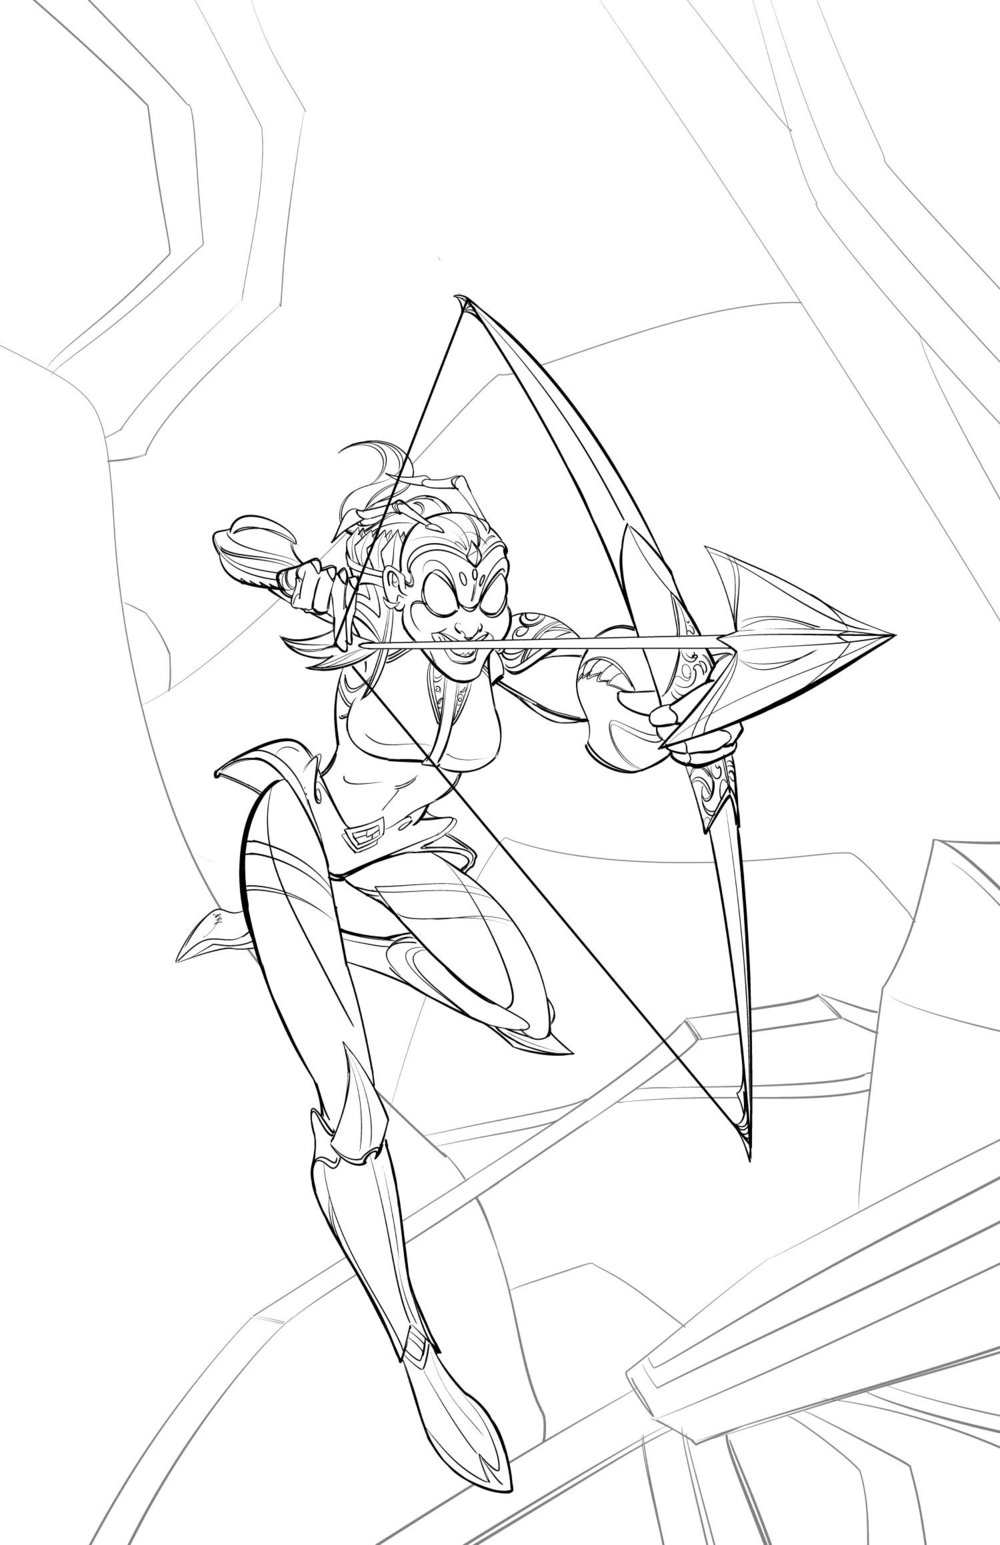 HIVESMASHERS-cg-archer-ink-001.jpg